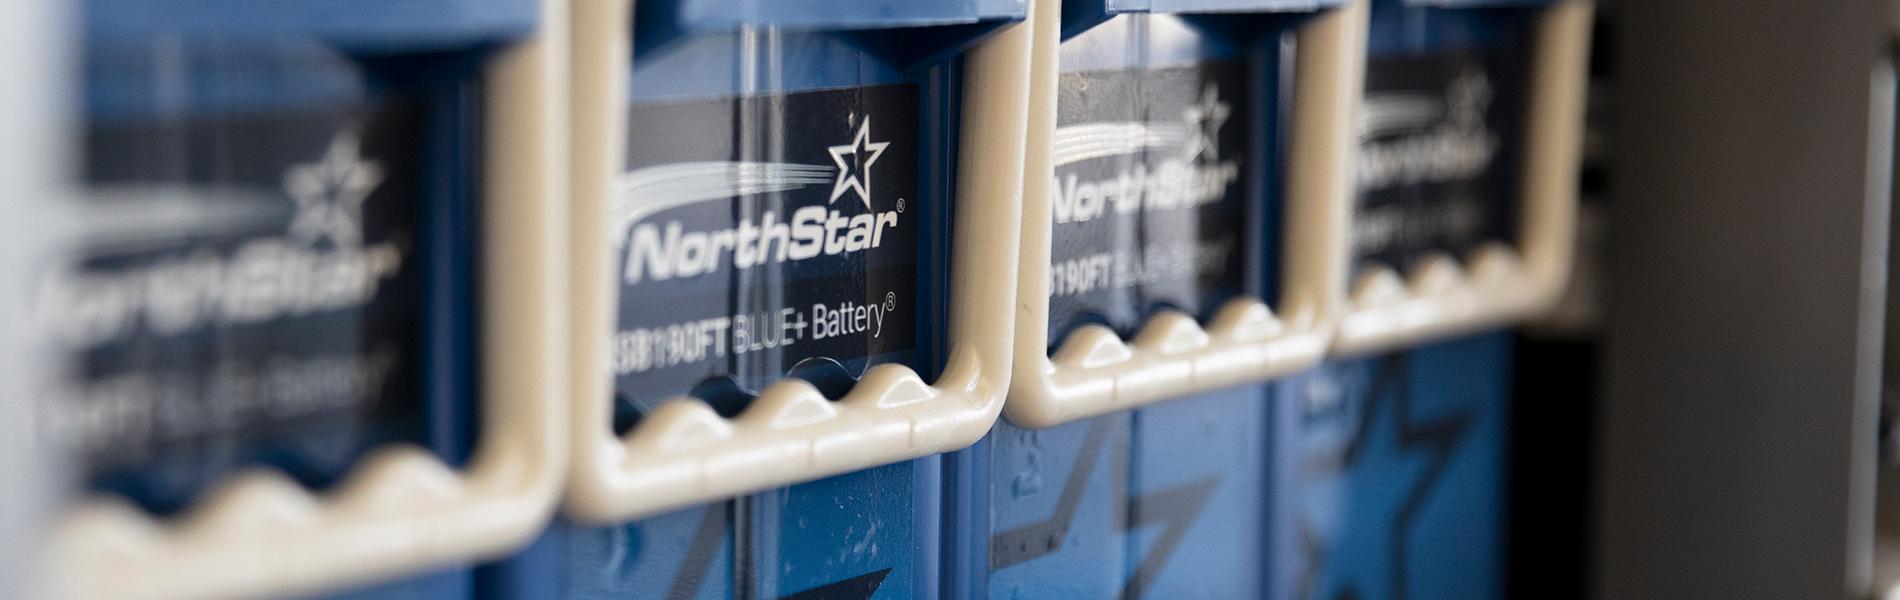 NORTHSTAR NSB BLUE+